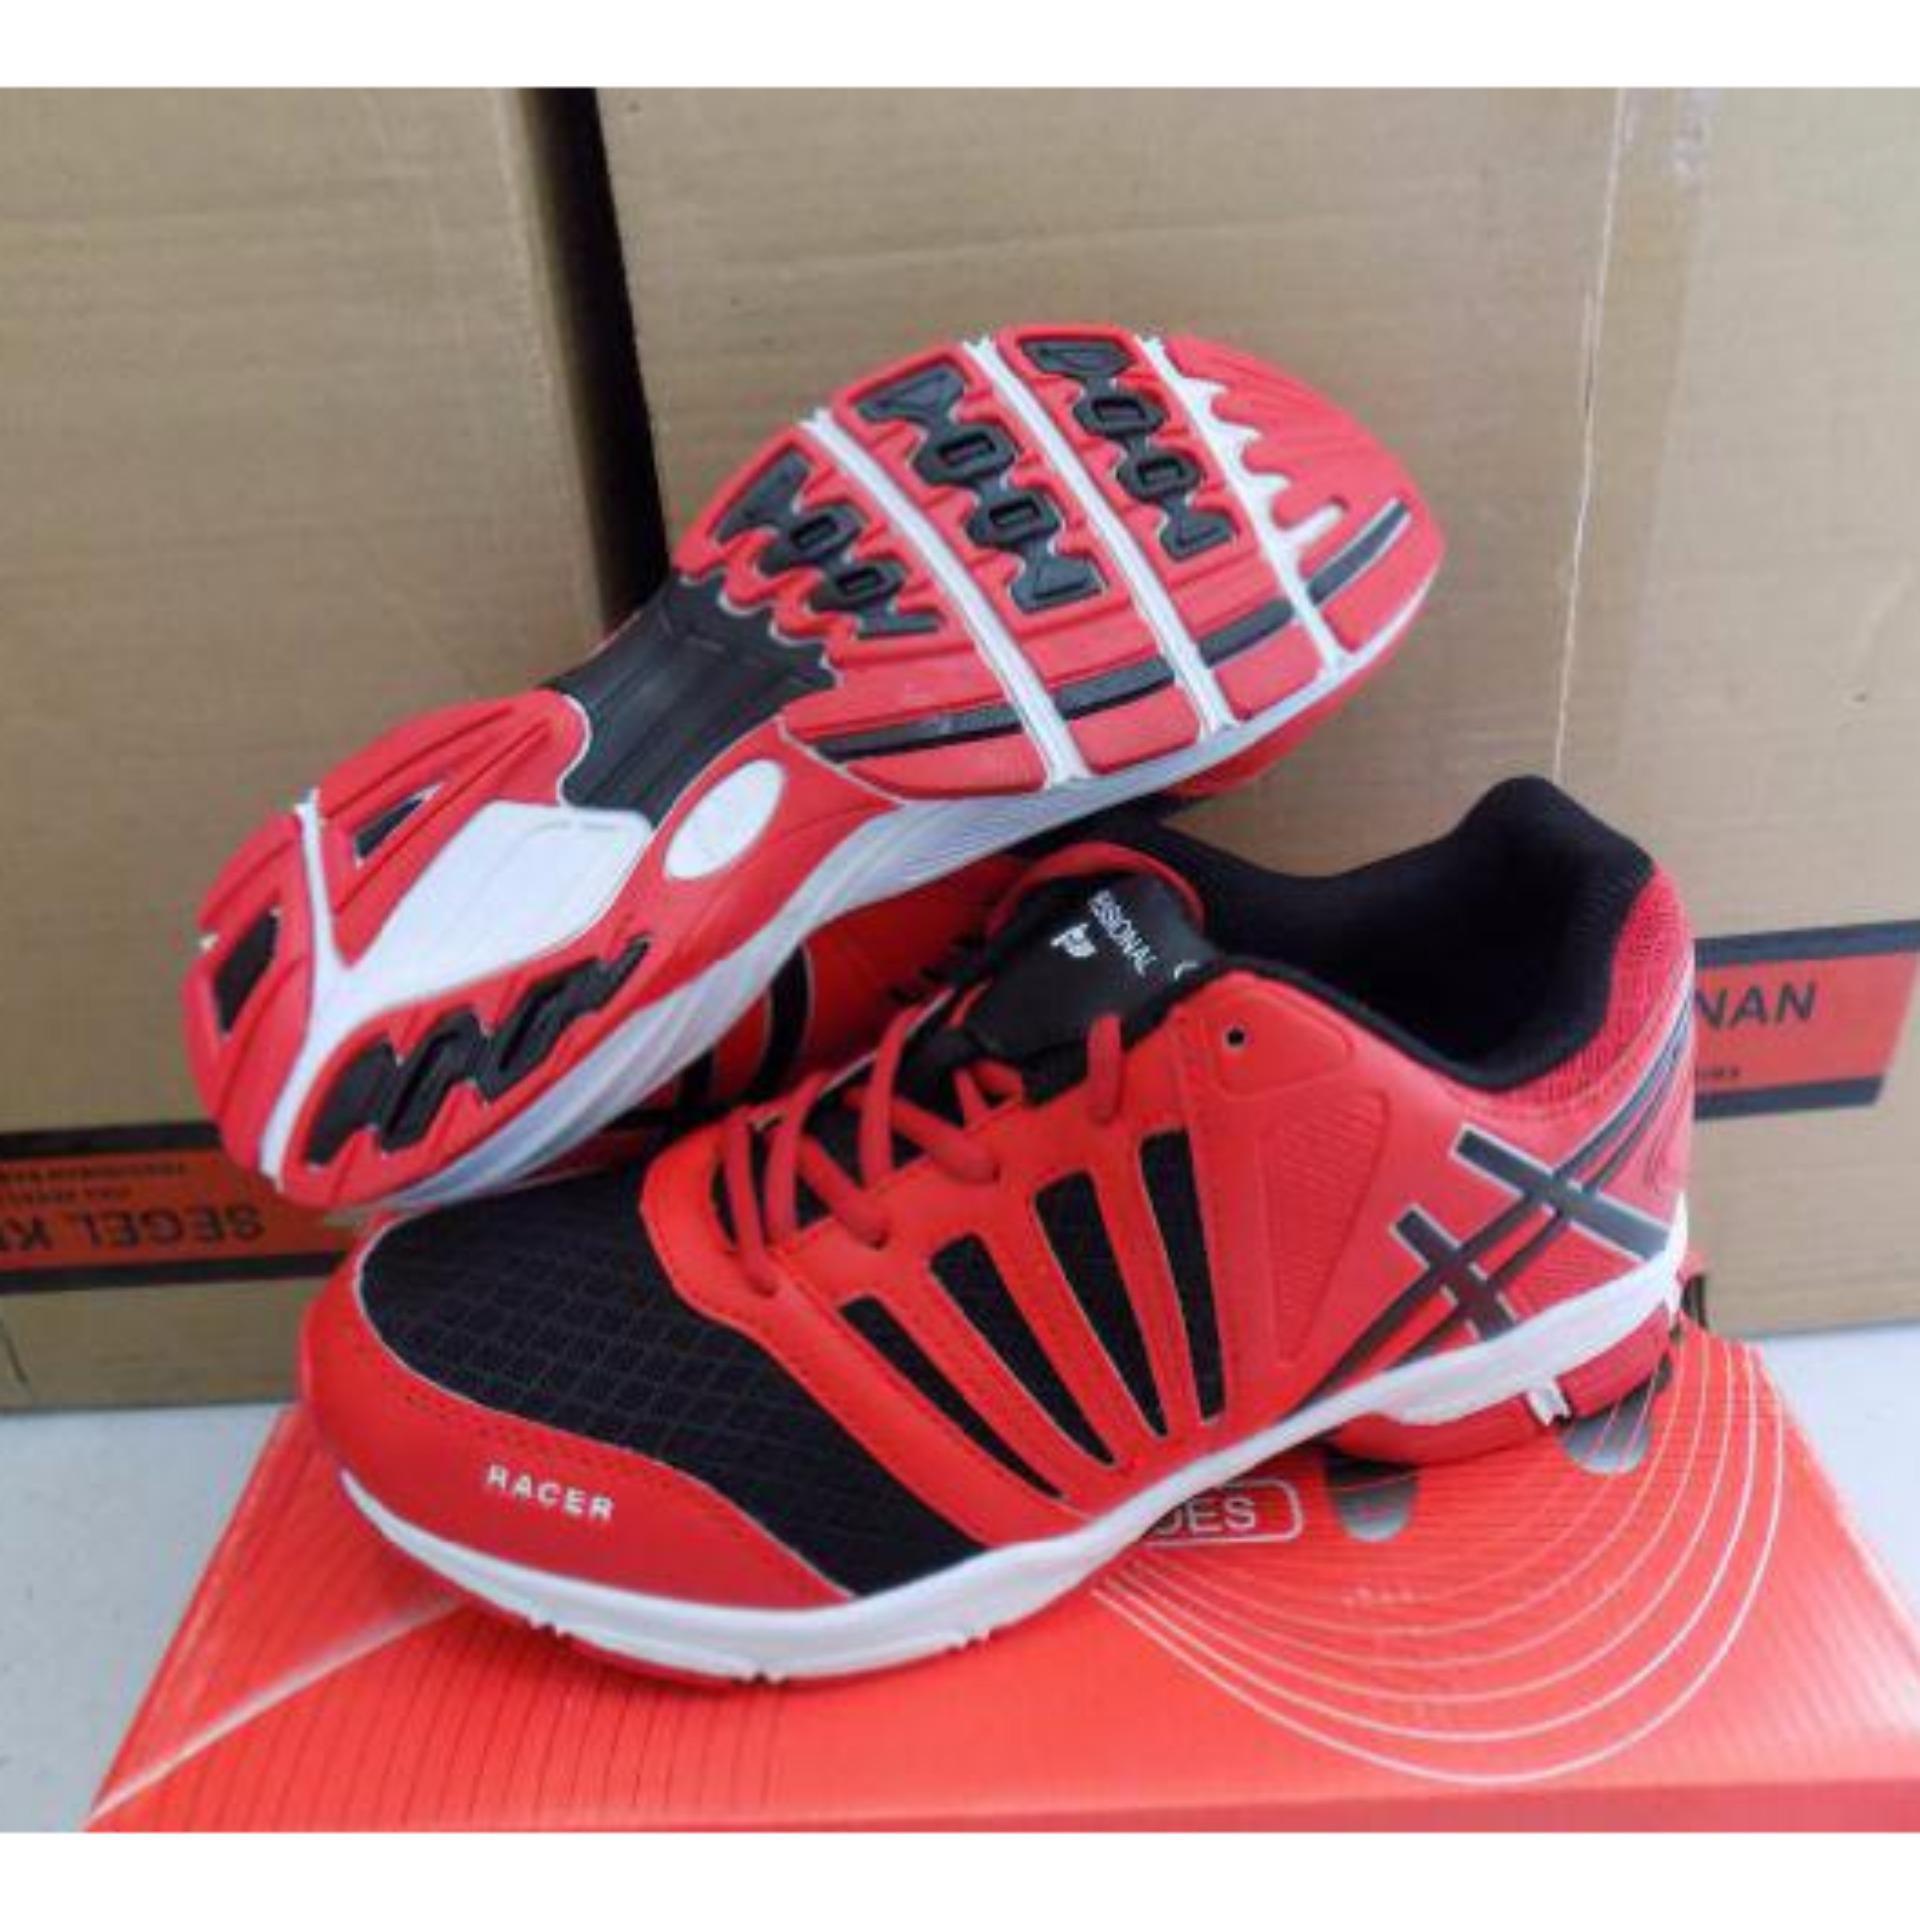 Flash Sale Racer Sepatu Lari Profesional - Merah Hitam